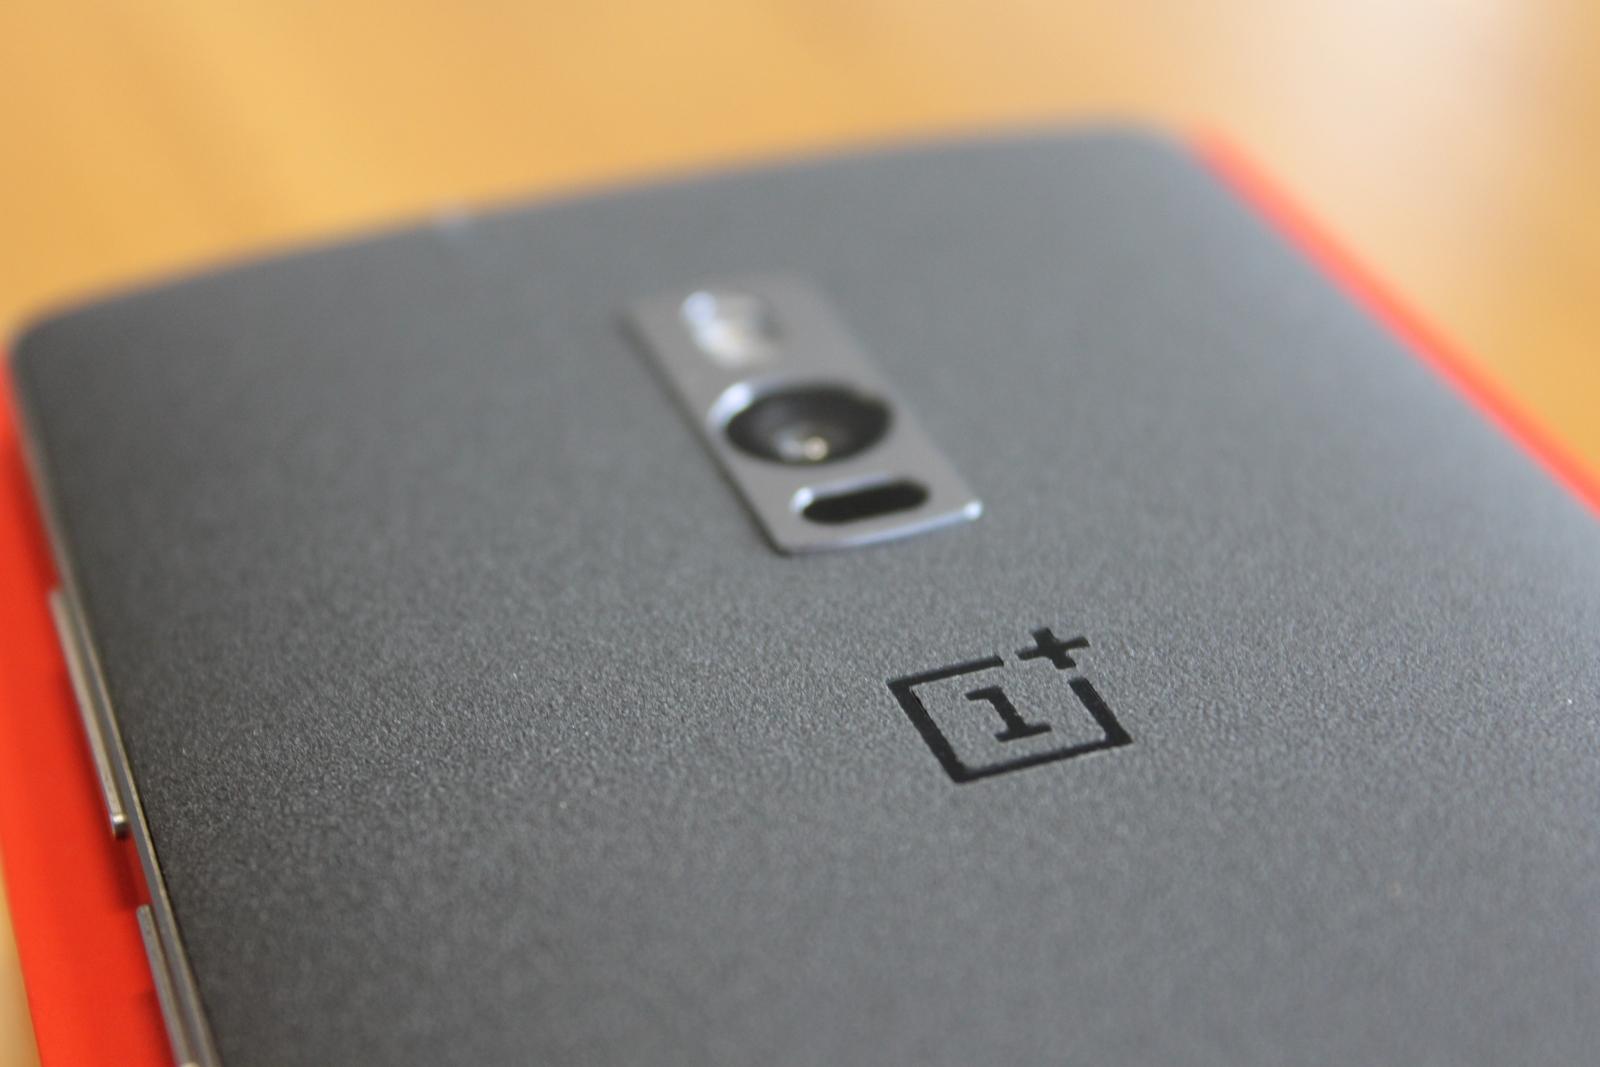 OnePlus 2 Review - Camera